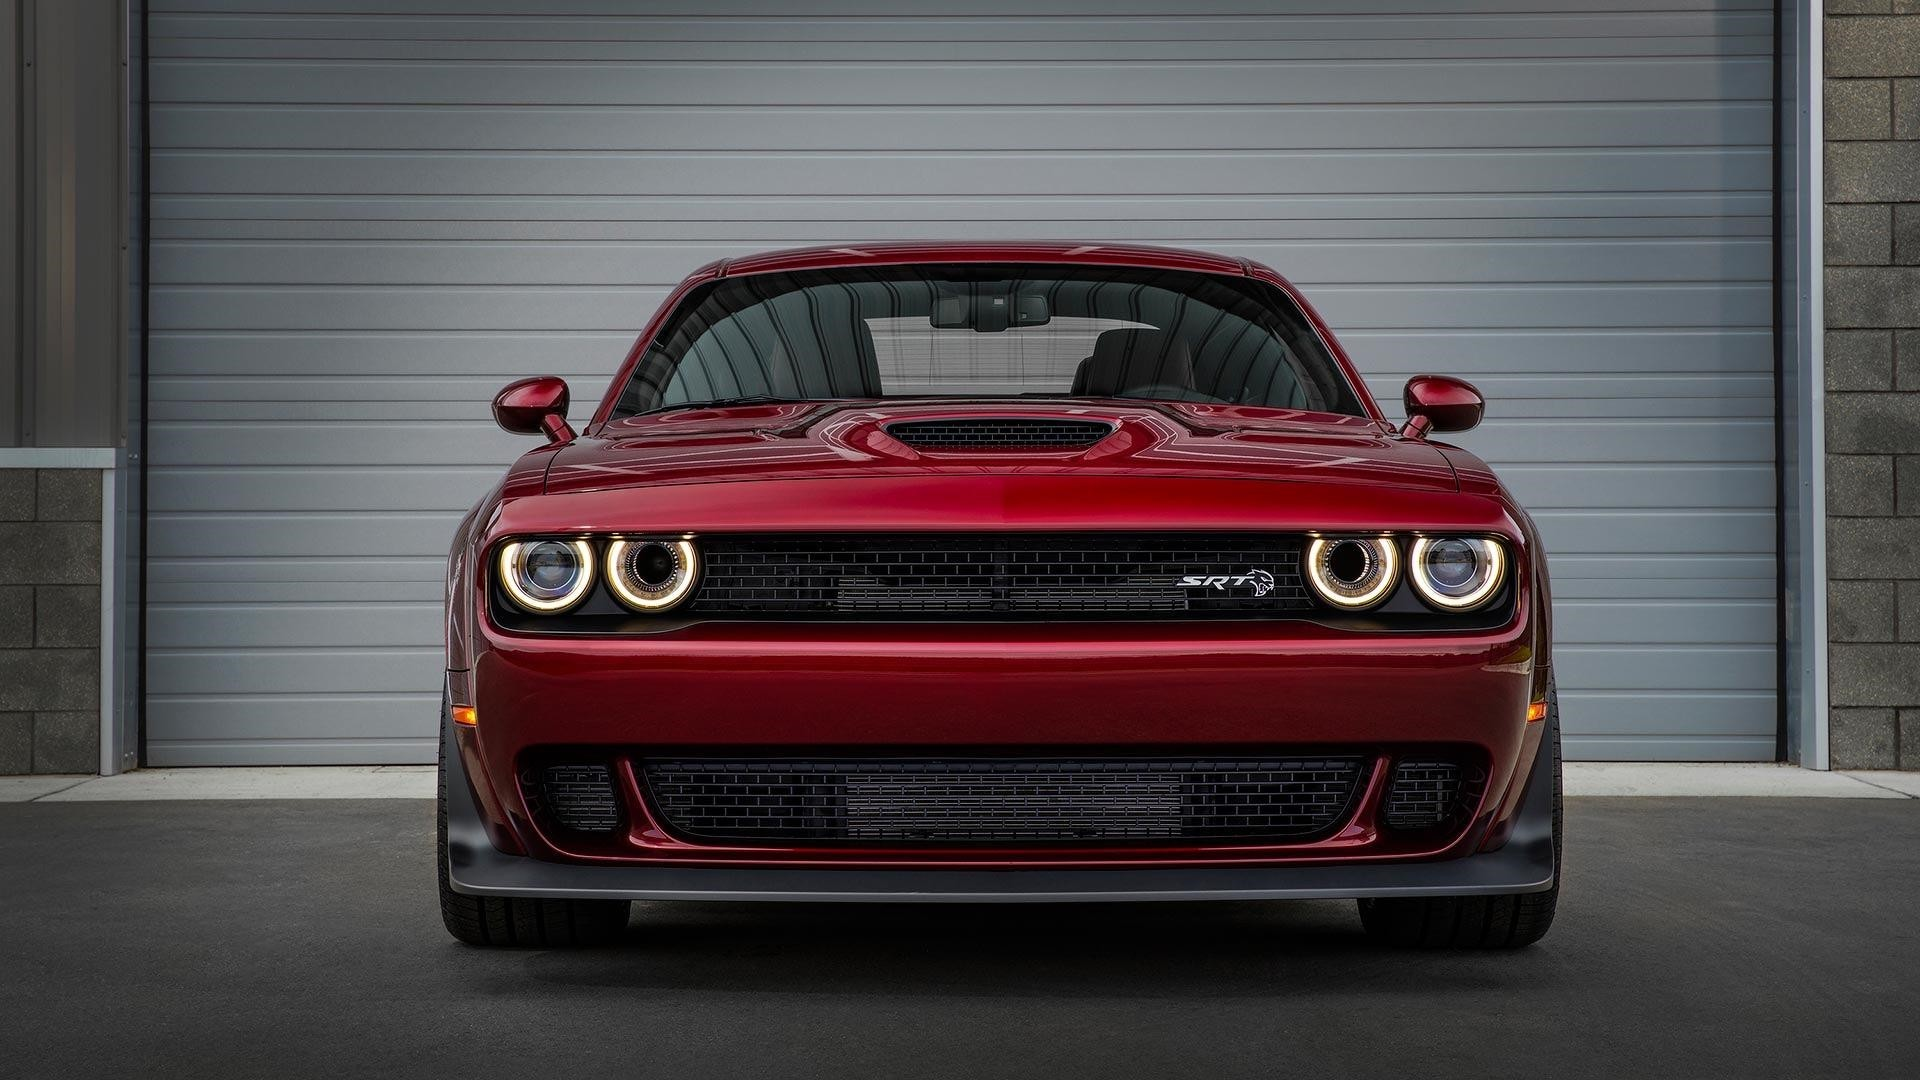 Dodge Challenger Srt Hellcat Wallpaper Free